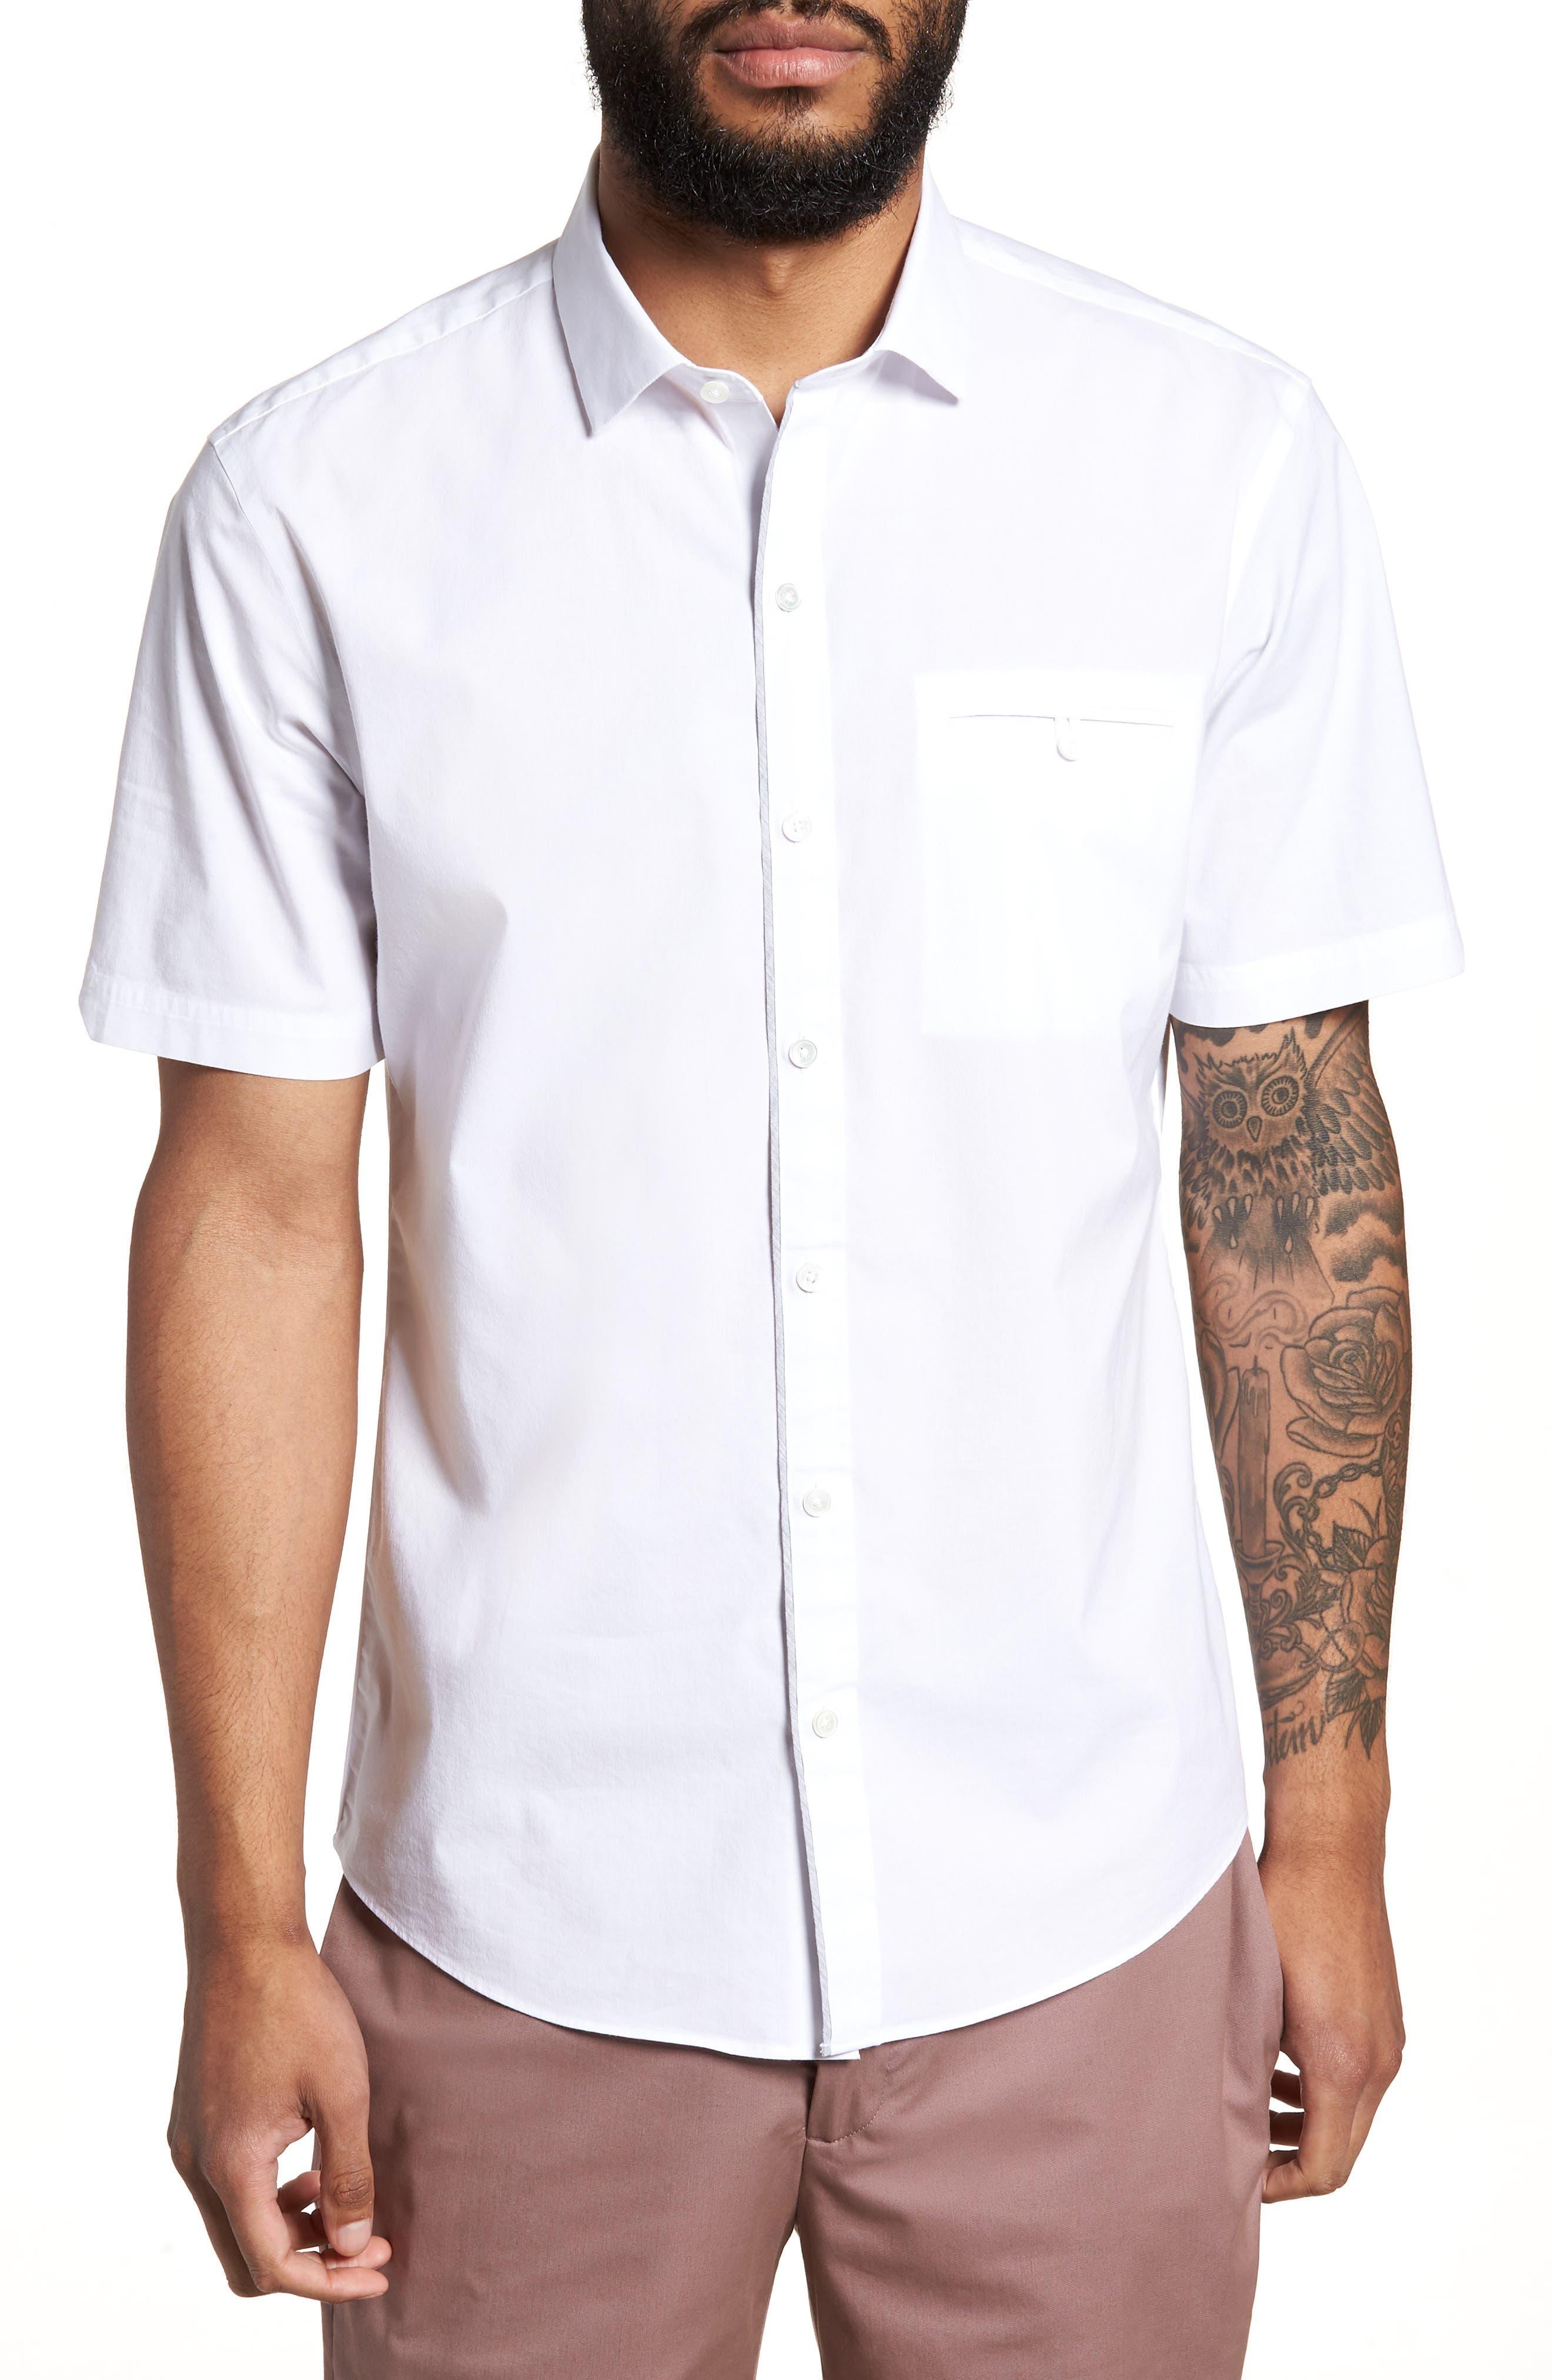 Baumann Slim Fit Sport Shirt,                             Main thumbnail 1, color,                             100